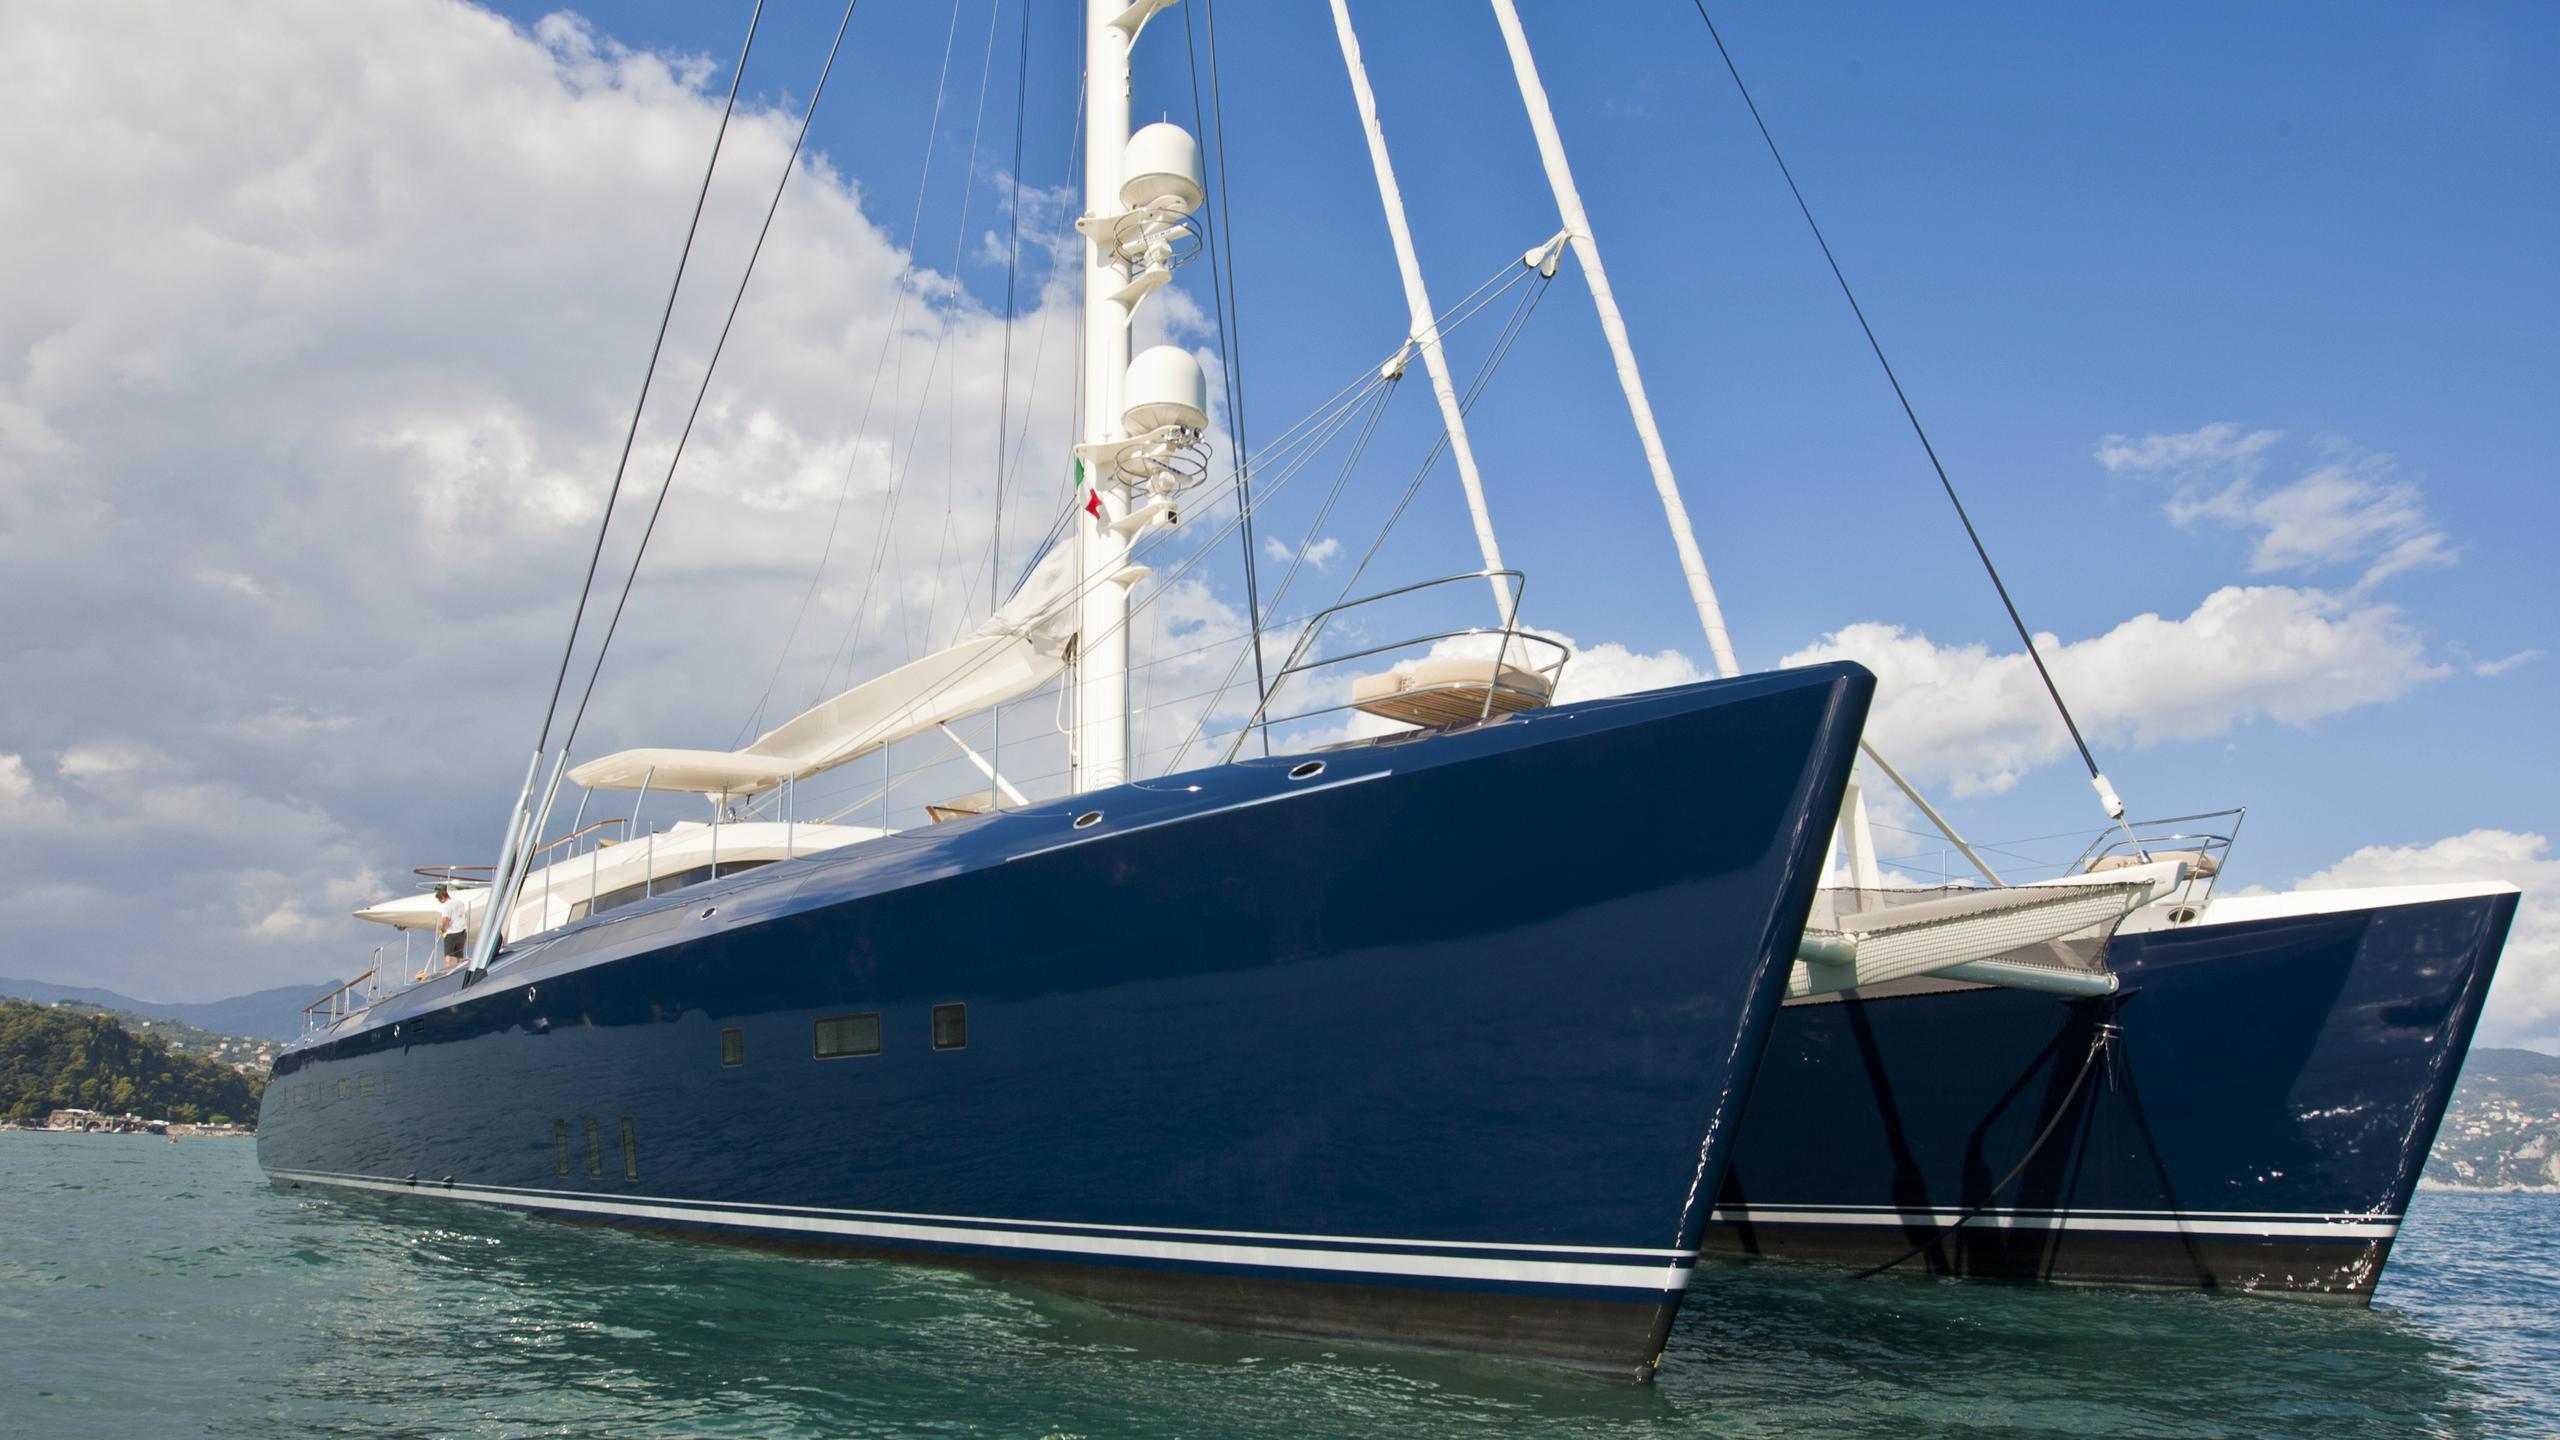 hemisphere-sailing-yacht-pendennis-2011-44m-bows